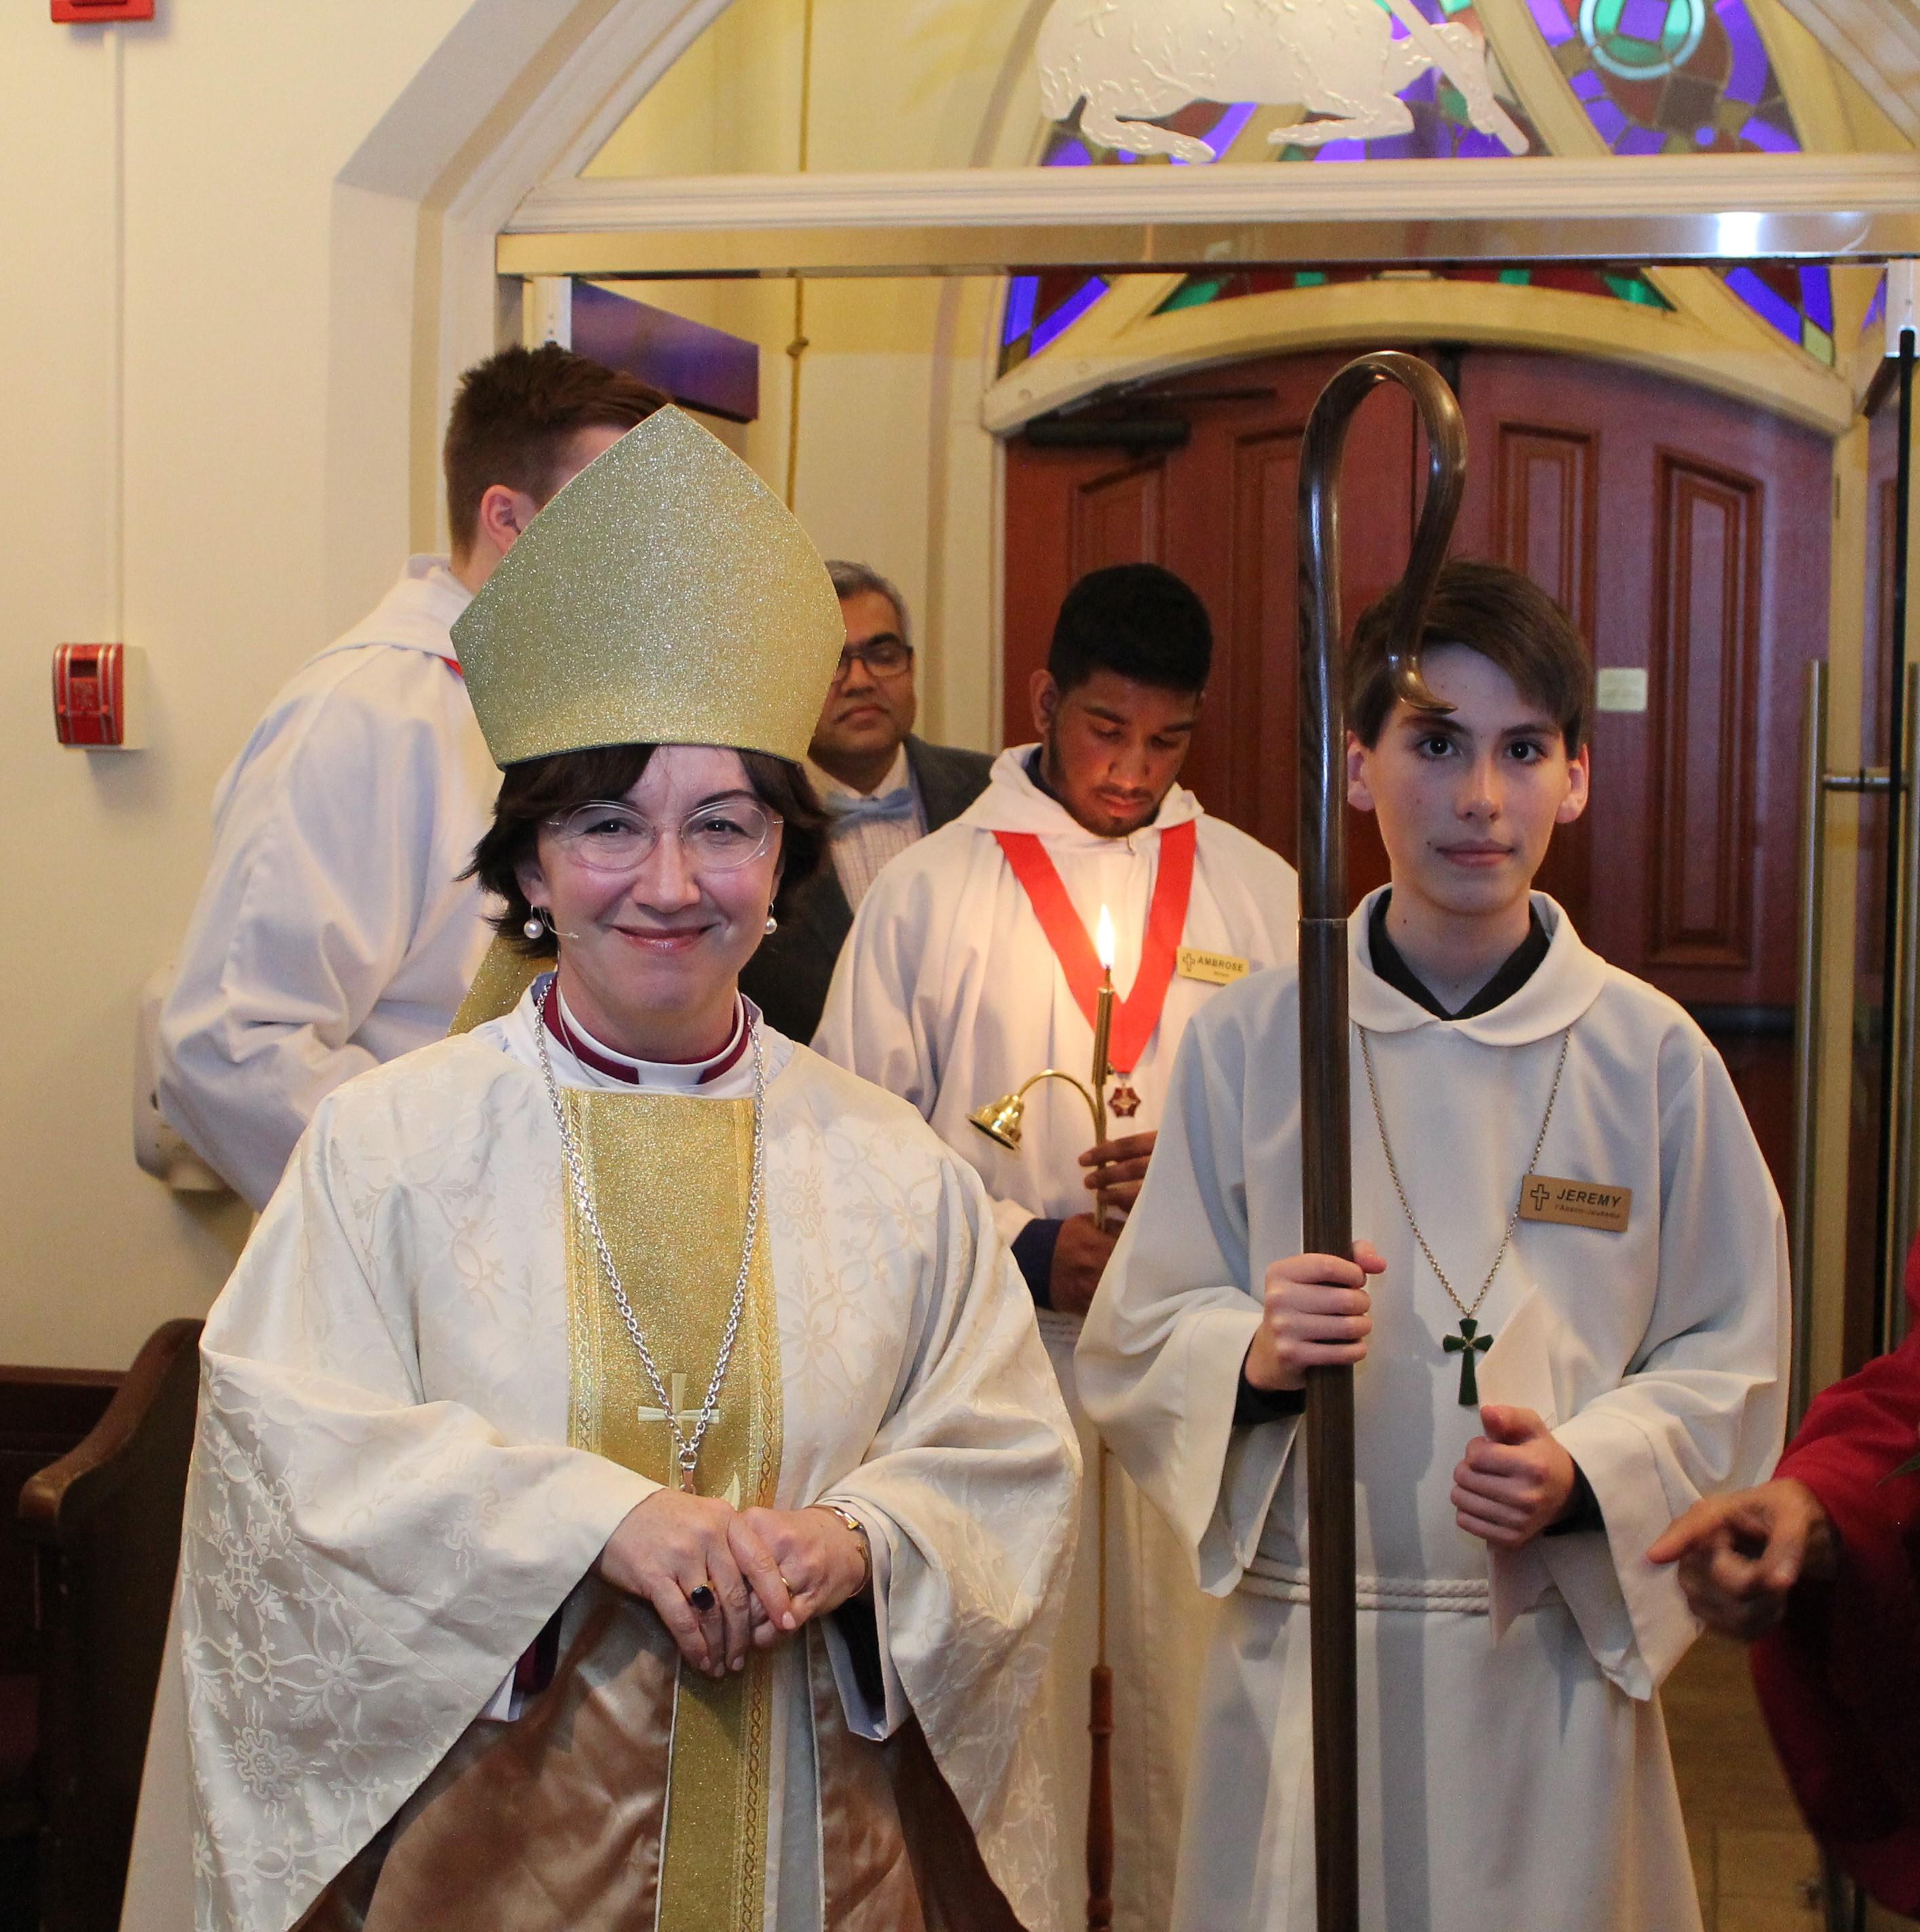 The Bishop & the Chaplain